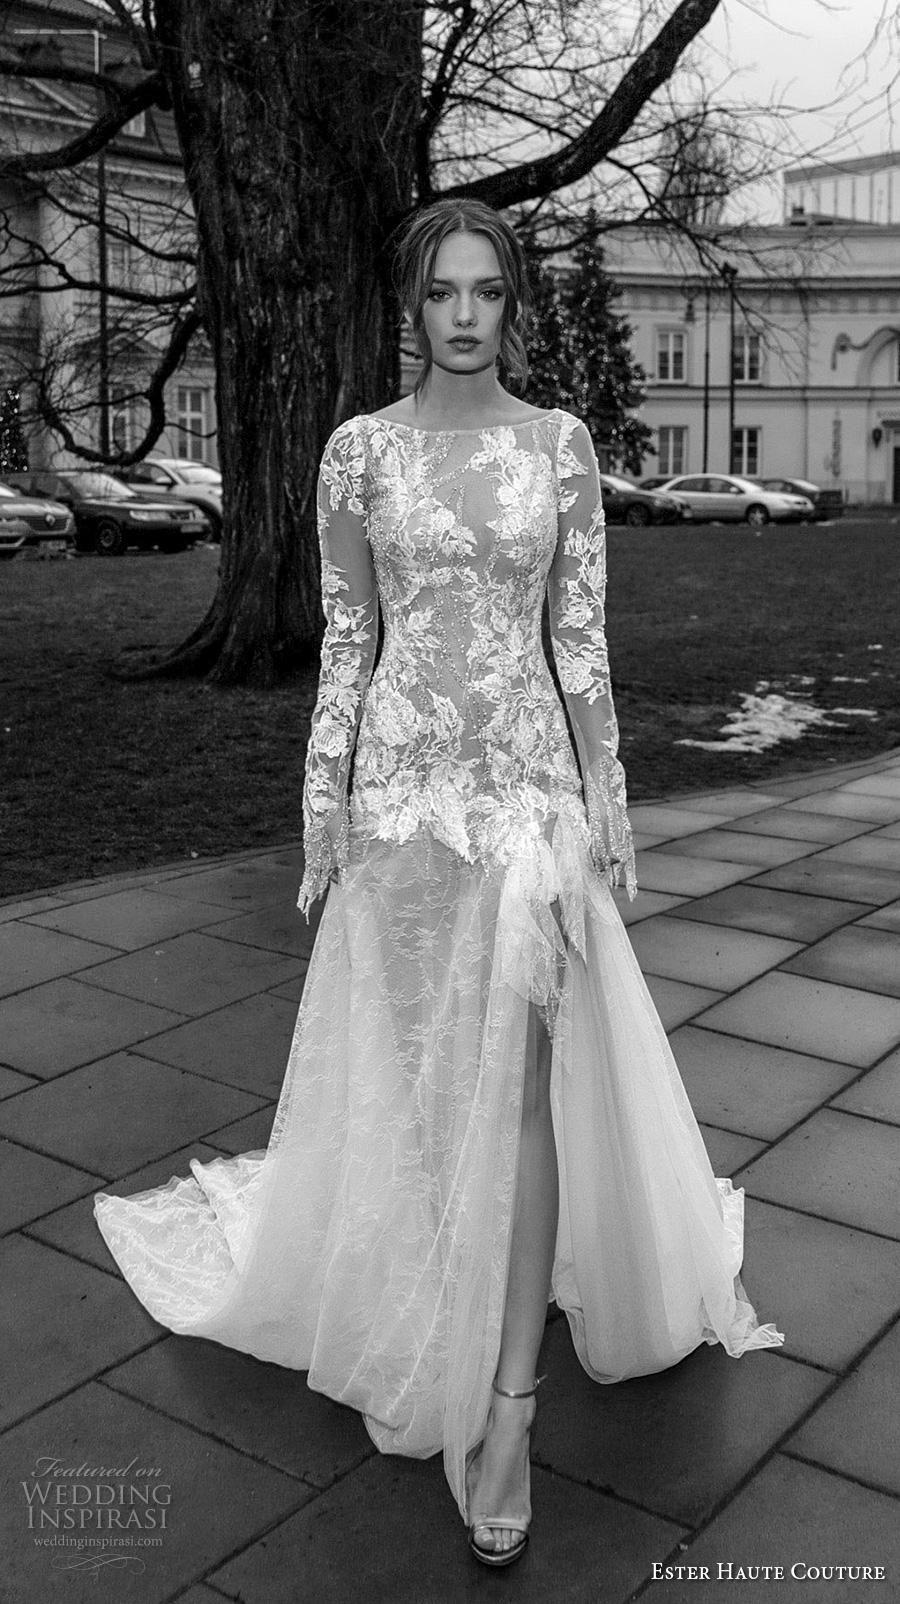 Ester haute couture wedding dresses f gowns